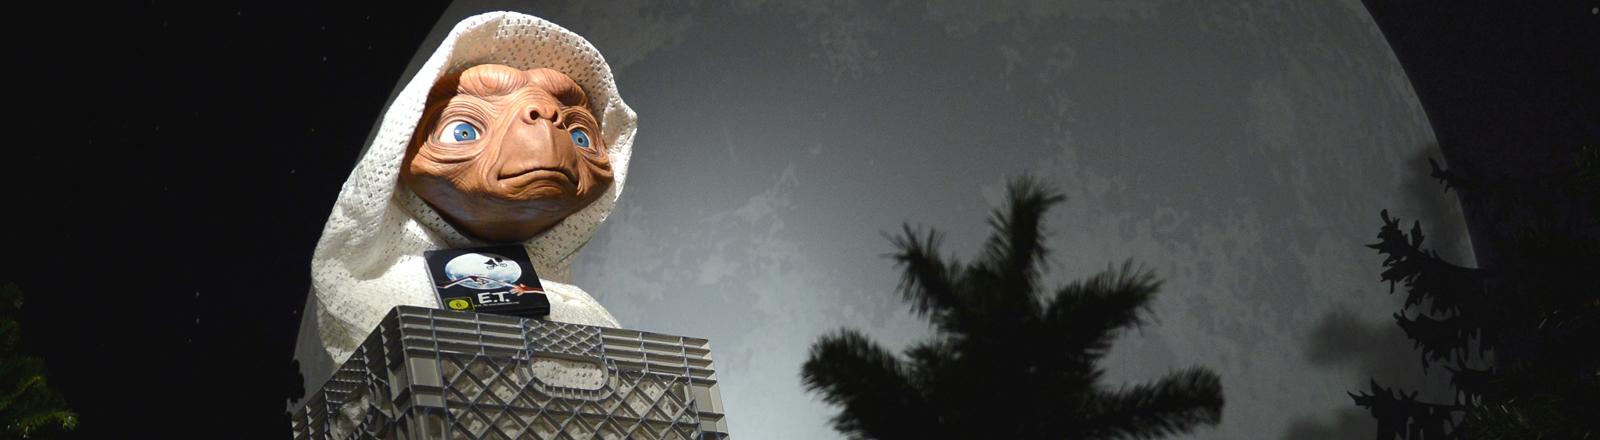 E.T. als Wachsfigur.